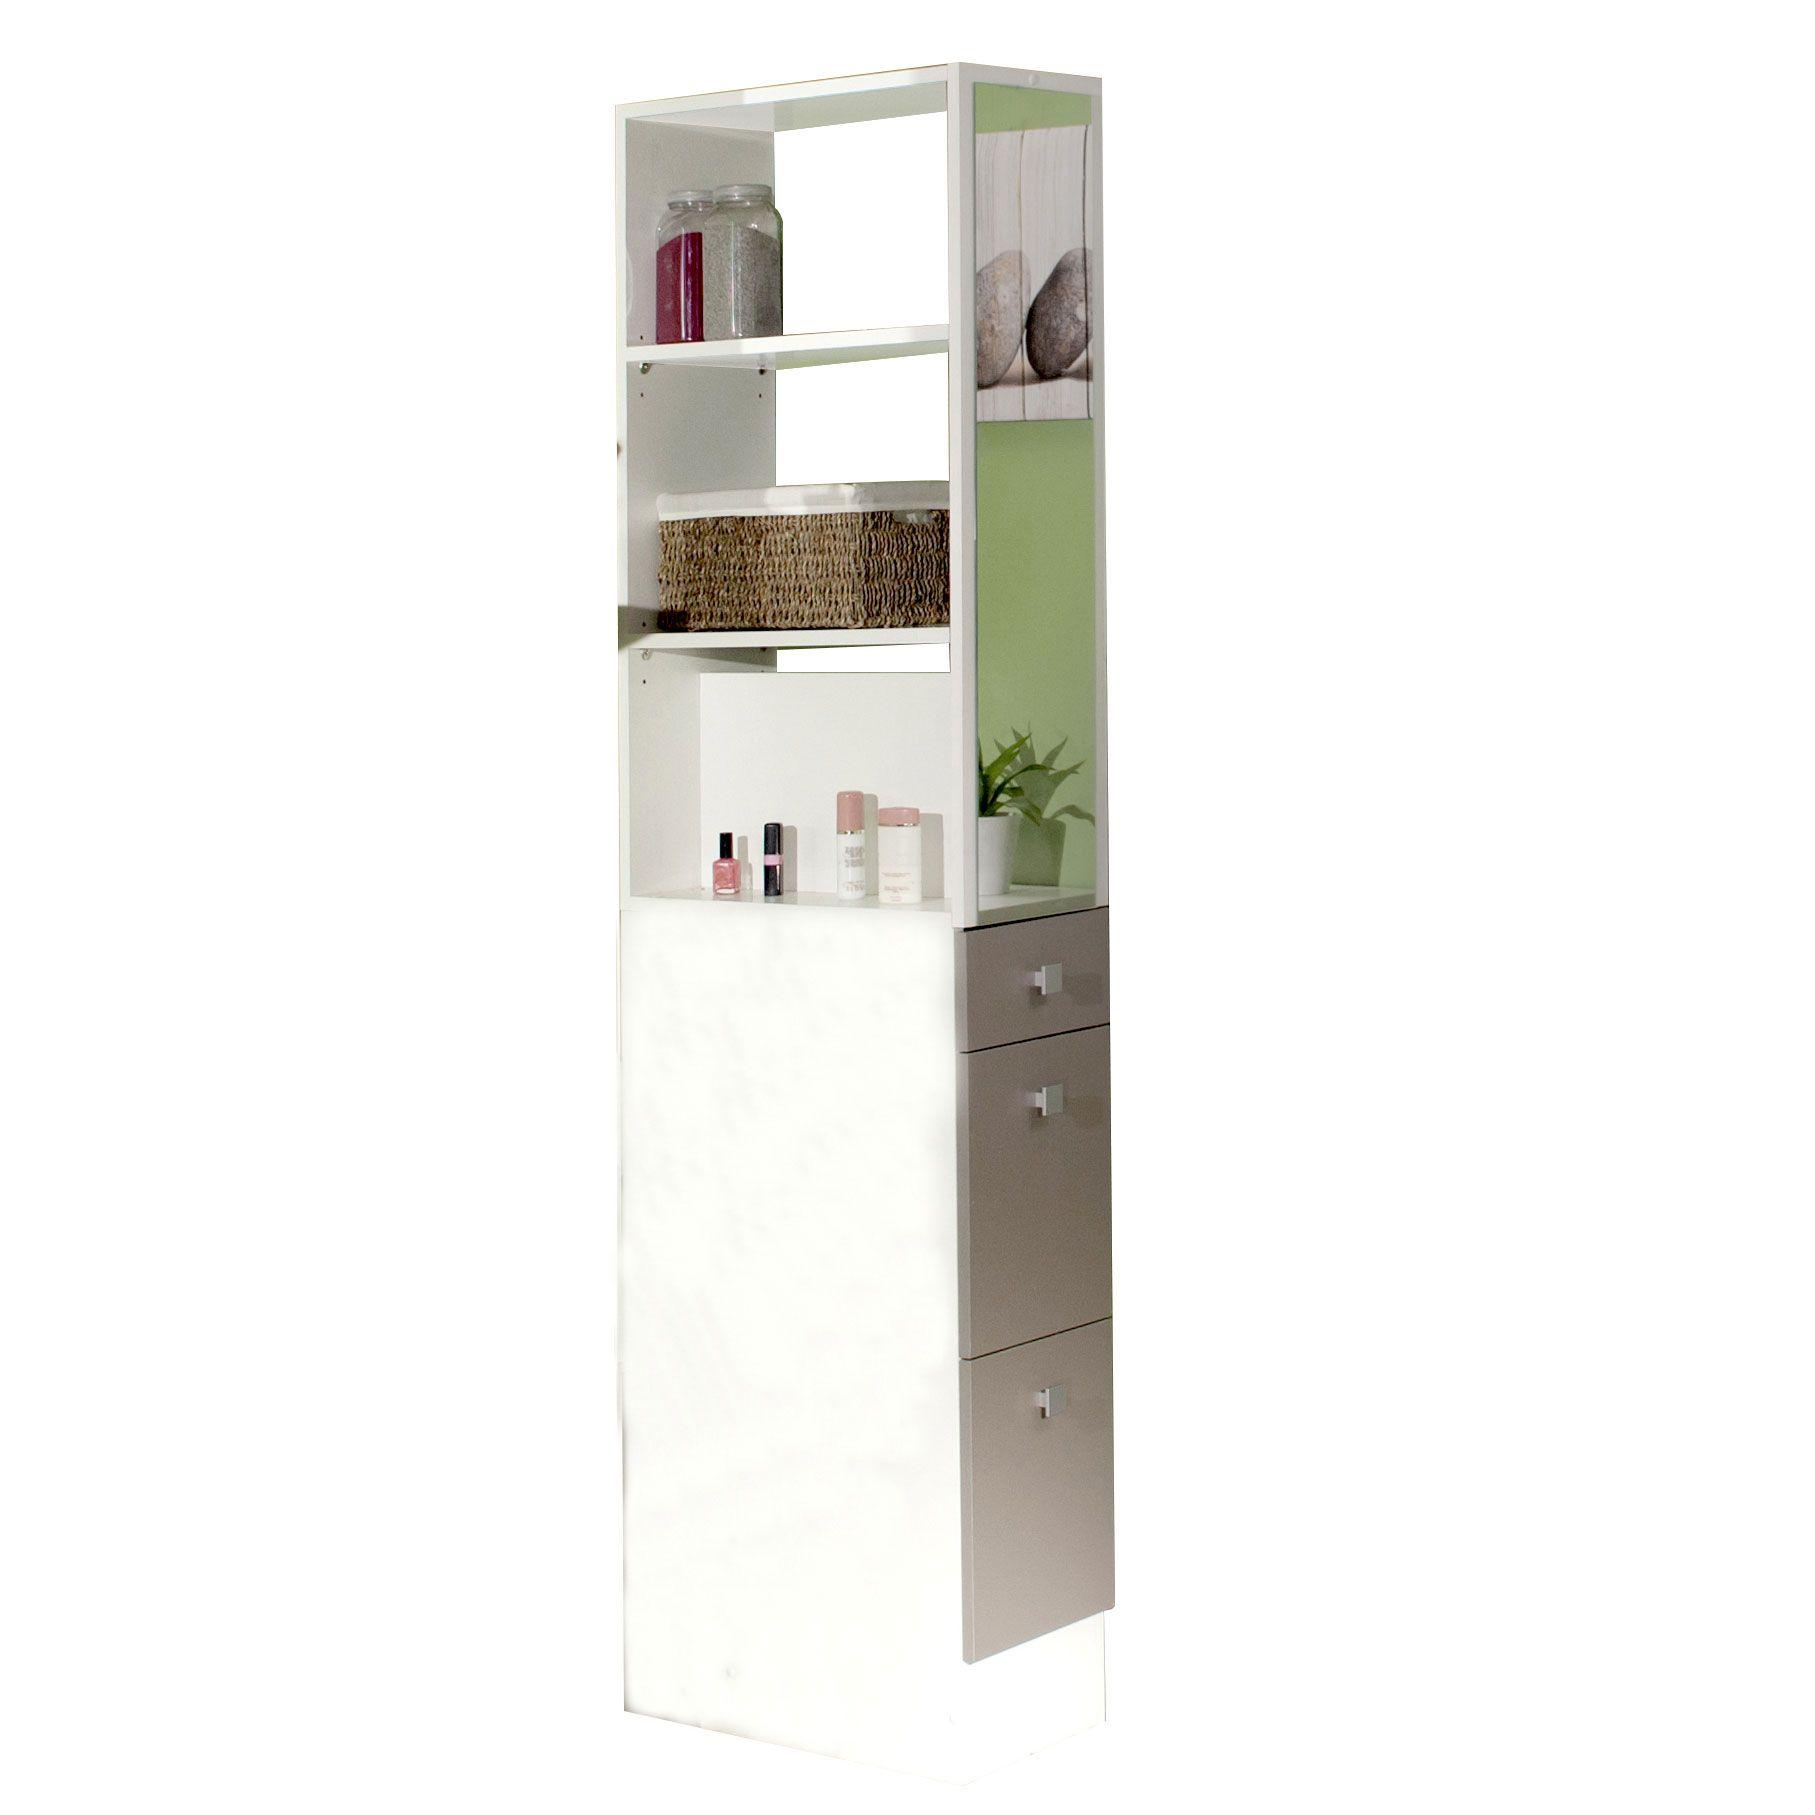 Colonne salle de bain 3 tiroirs 1 miroir L24 5xP54xH181 50cm BANIO